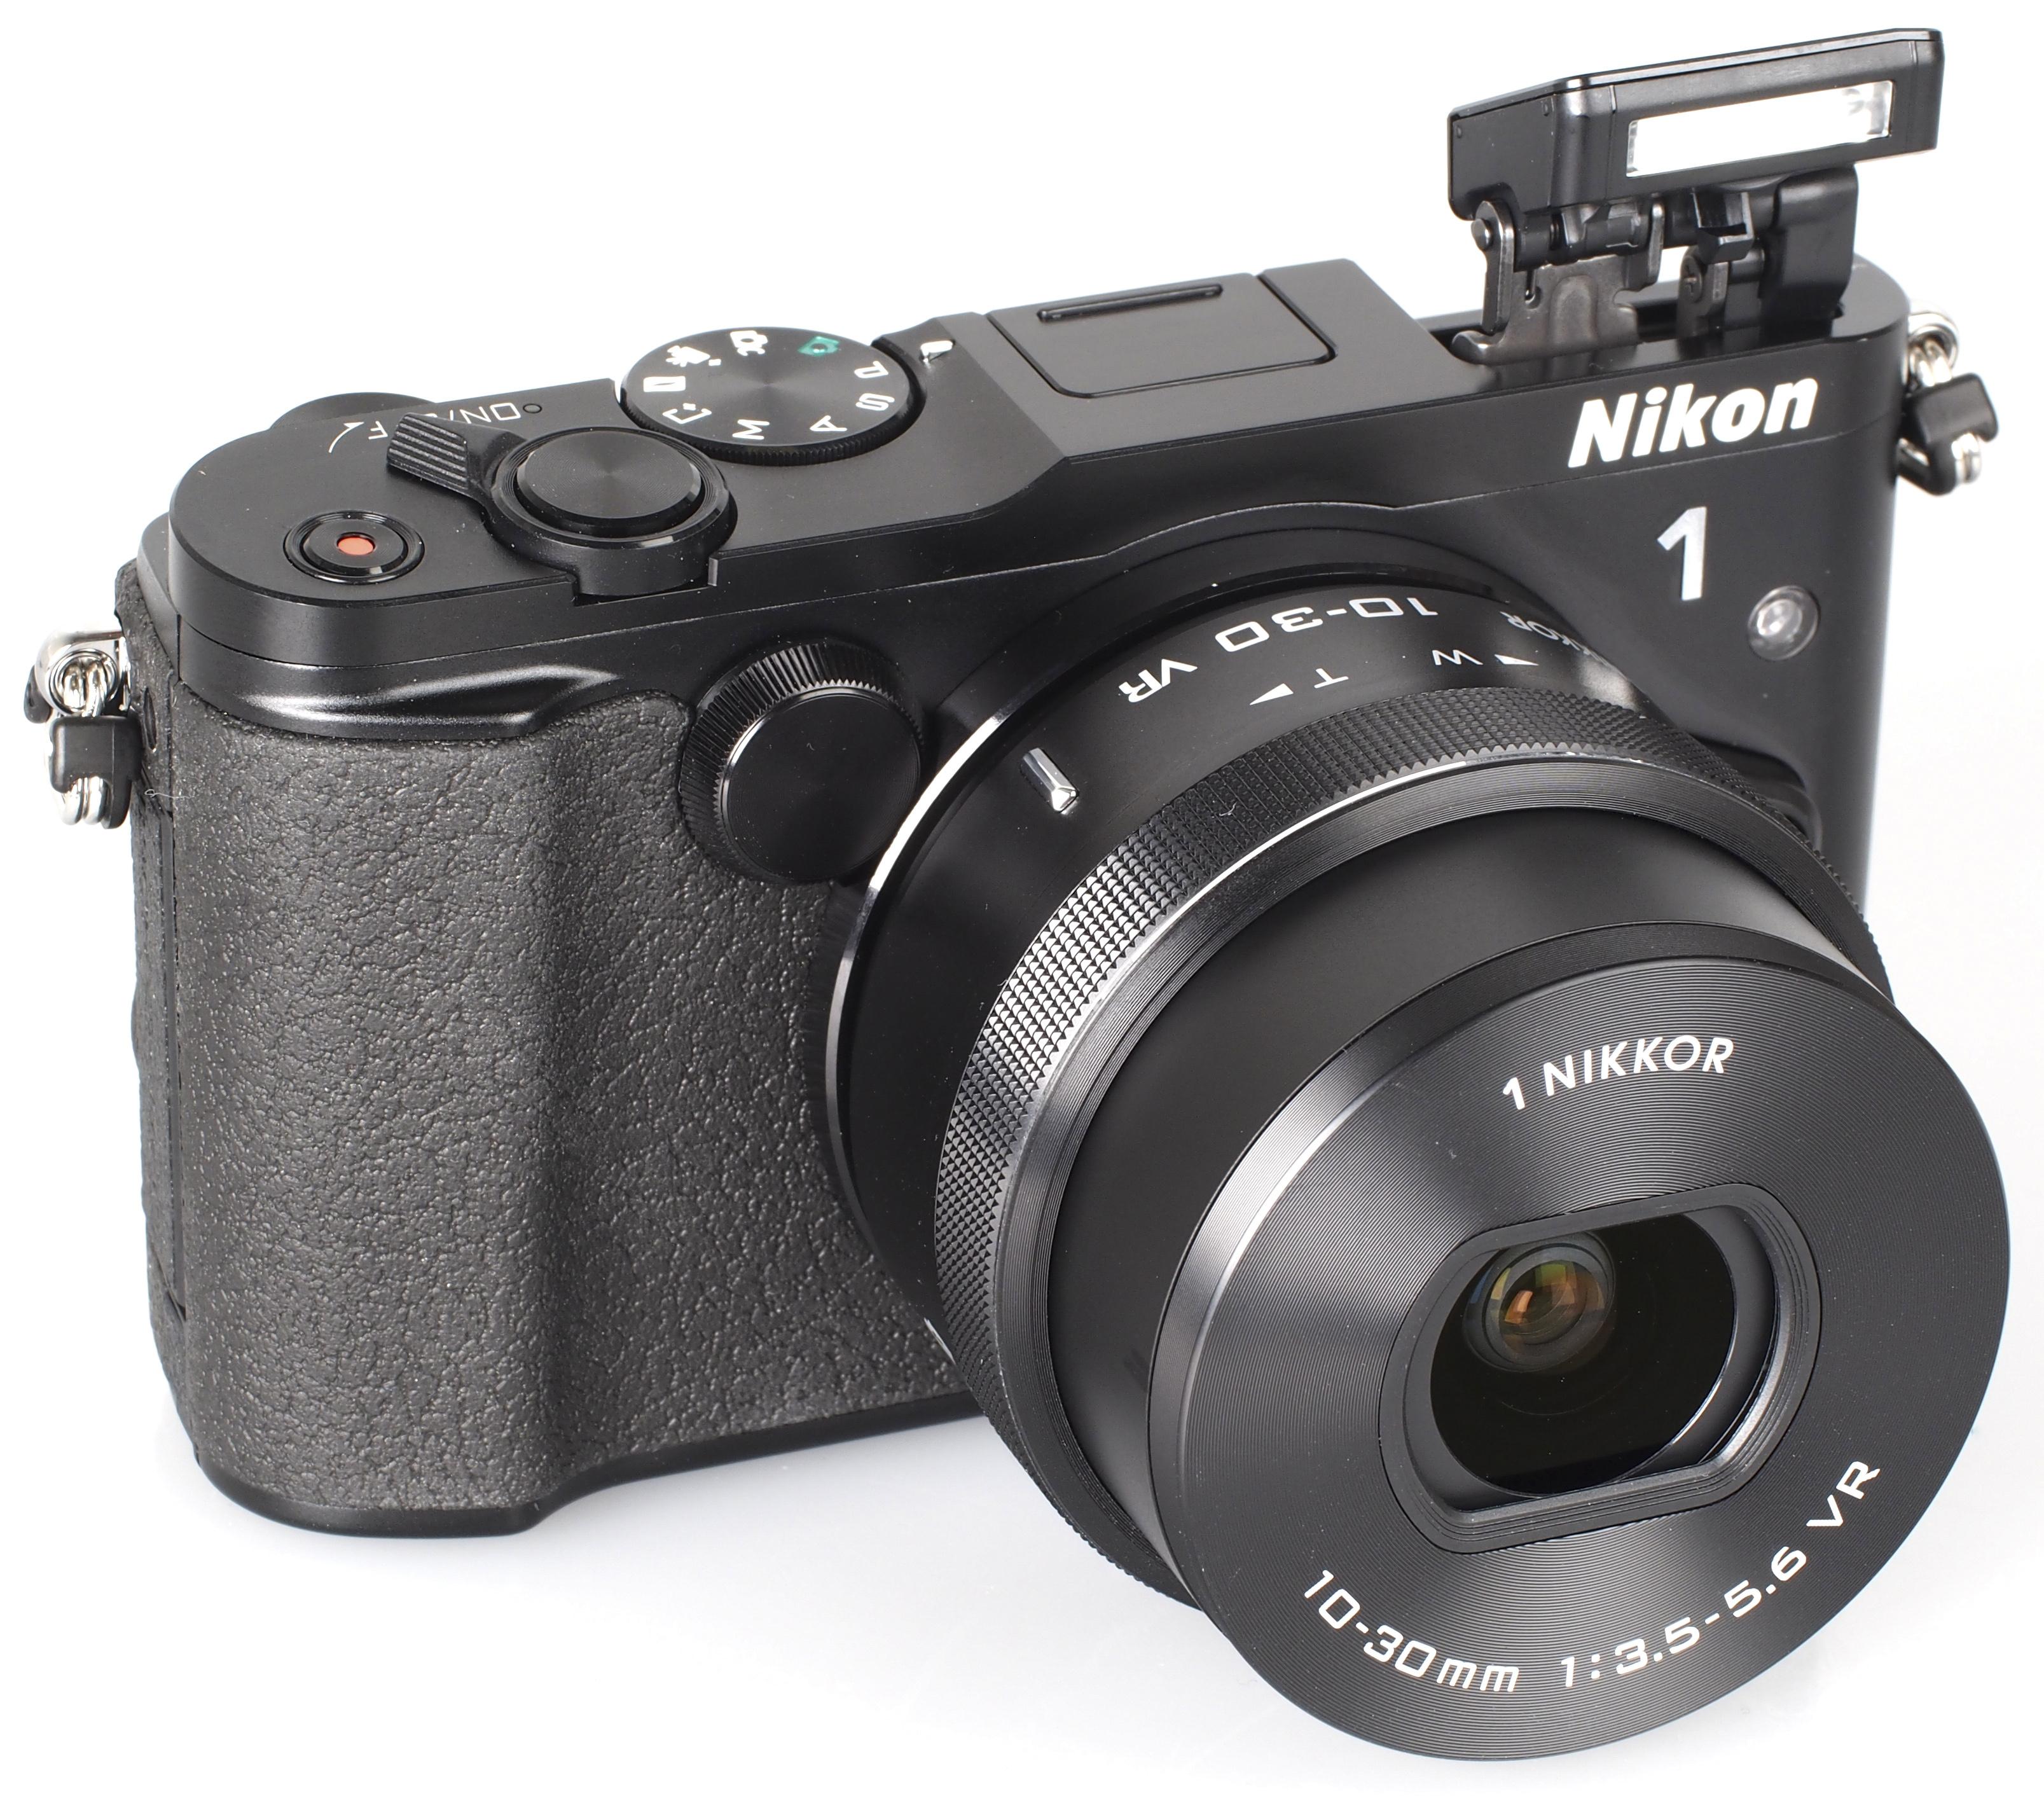 nikon 1 v3 full review rh ephotozine com Point a Camera On Manual Focus Nikon Manual Focus Digital Camera